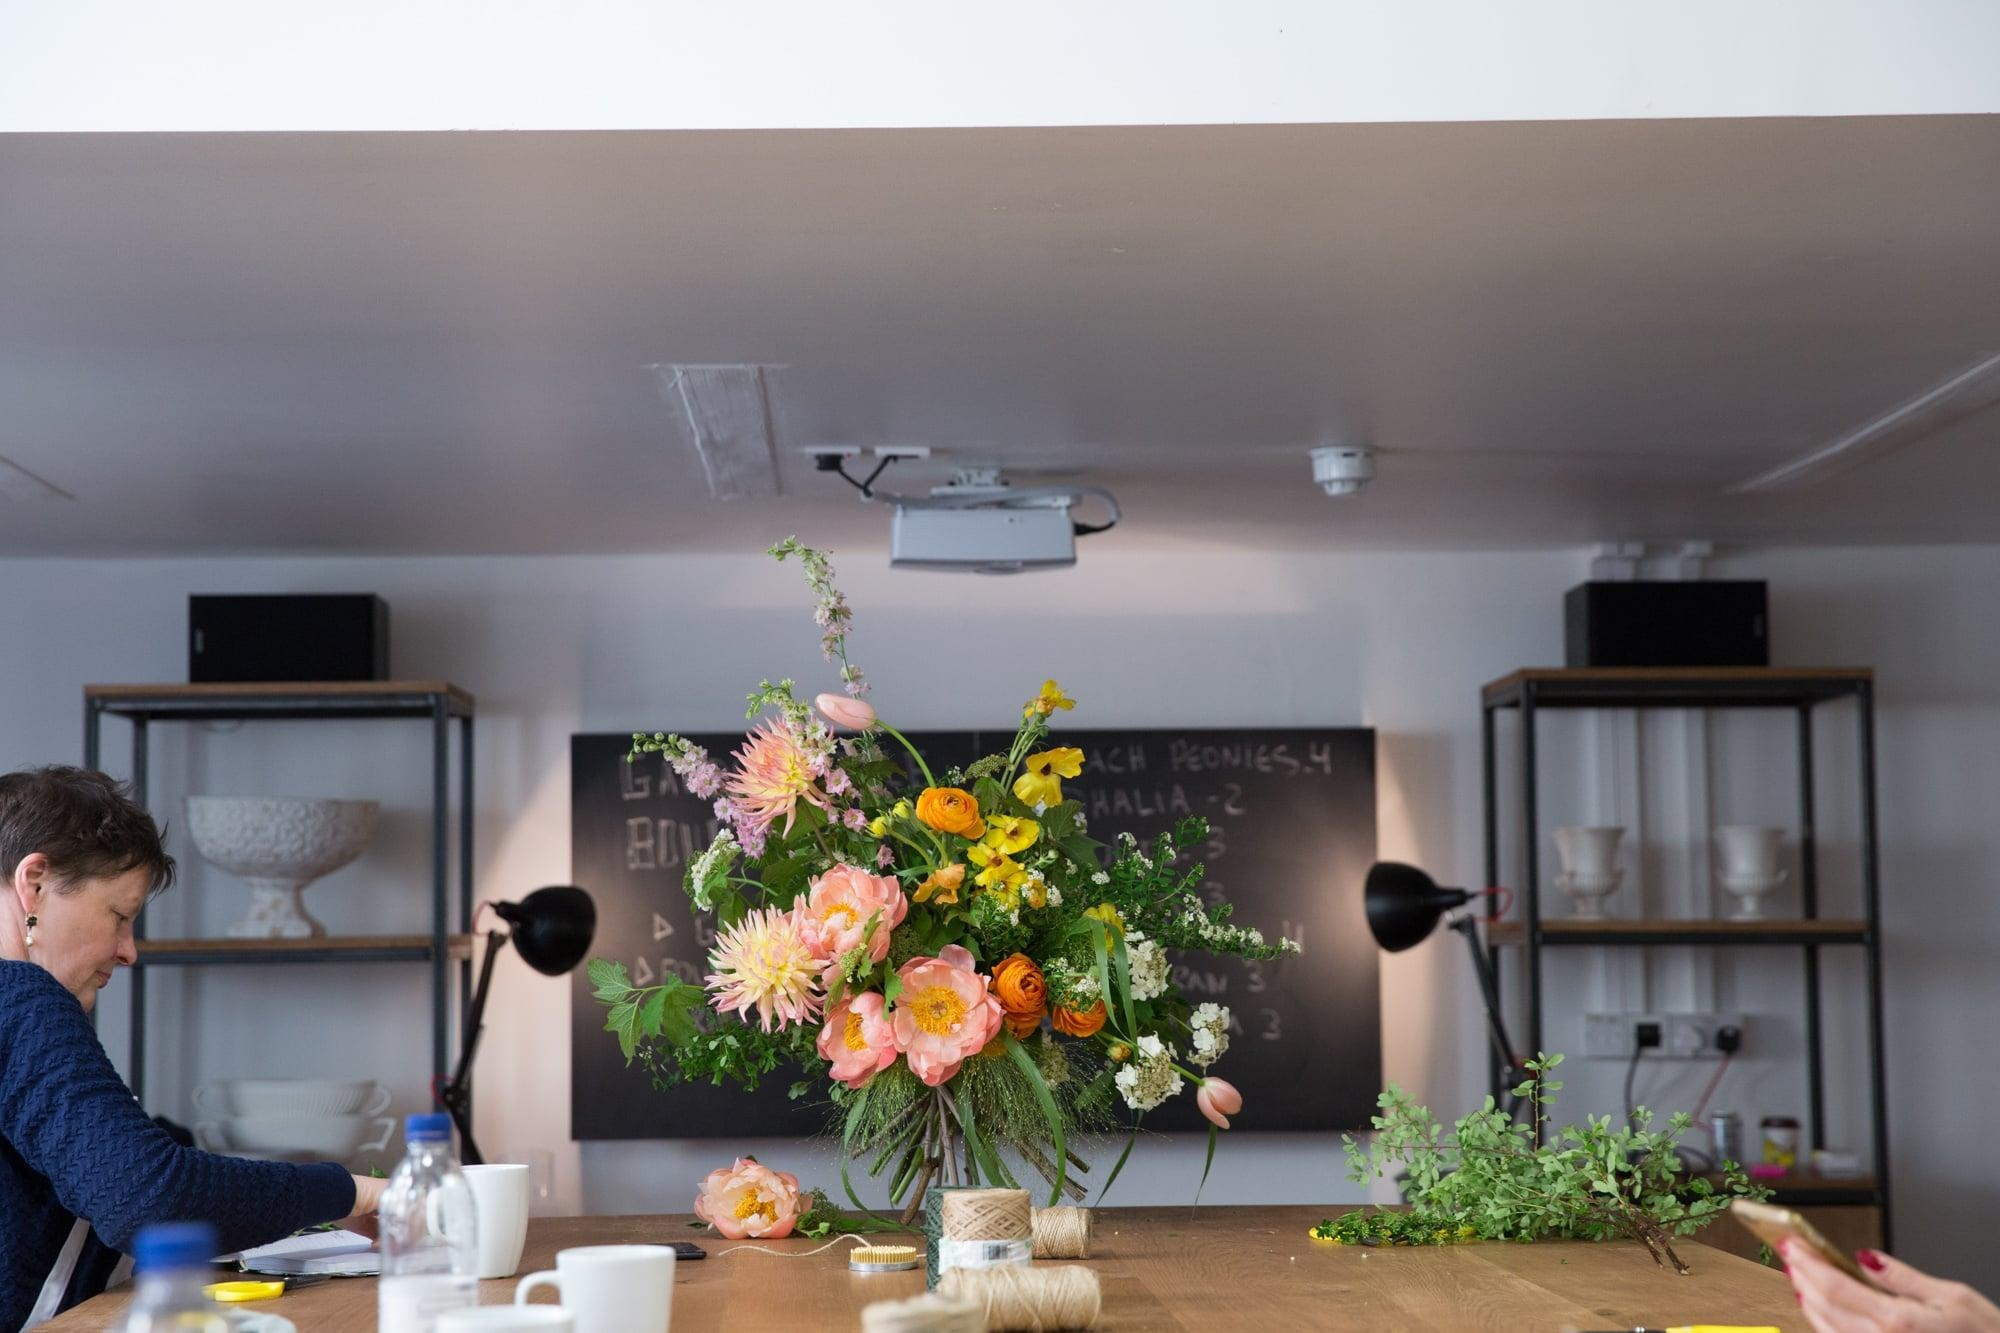 floristry_class_hand_tied_bouquet_masterclass_table_arrangement_london_flower_school_floristry_natural_style_bouquet